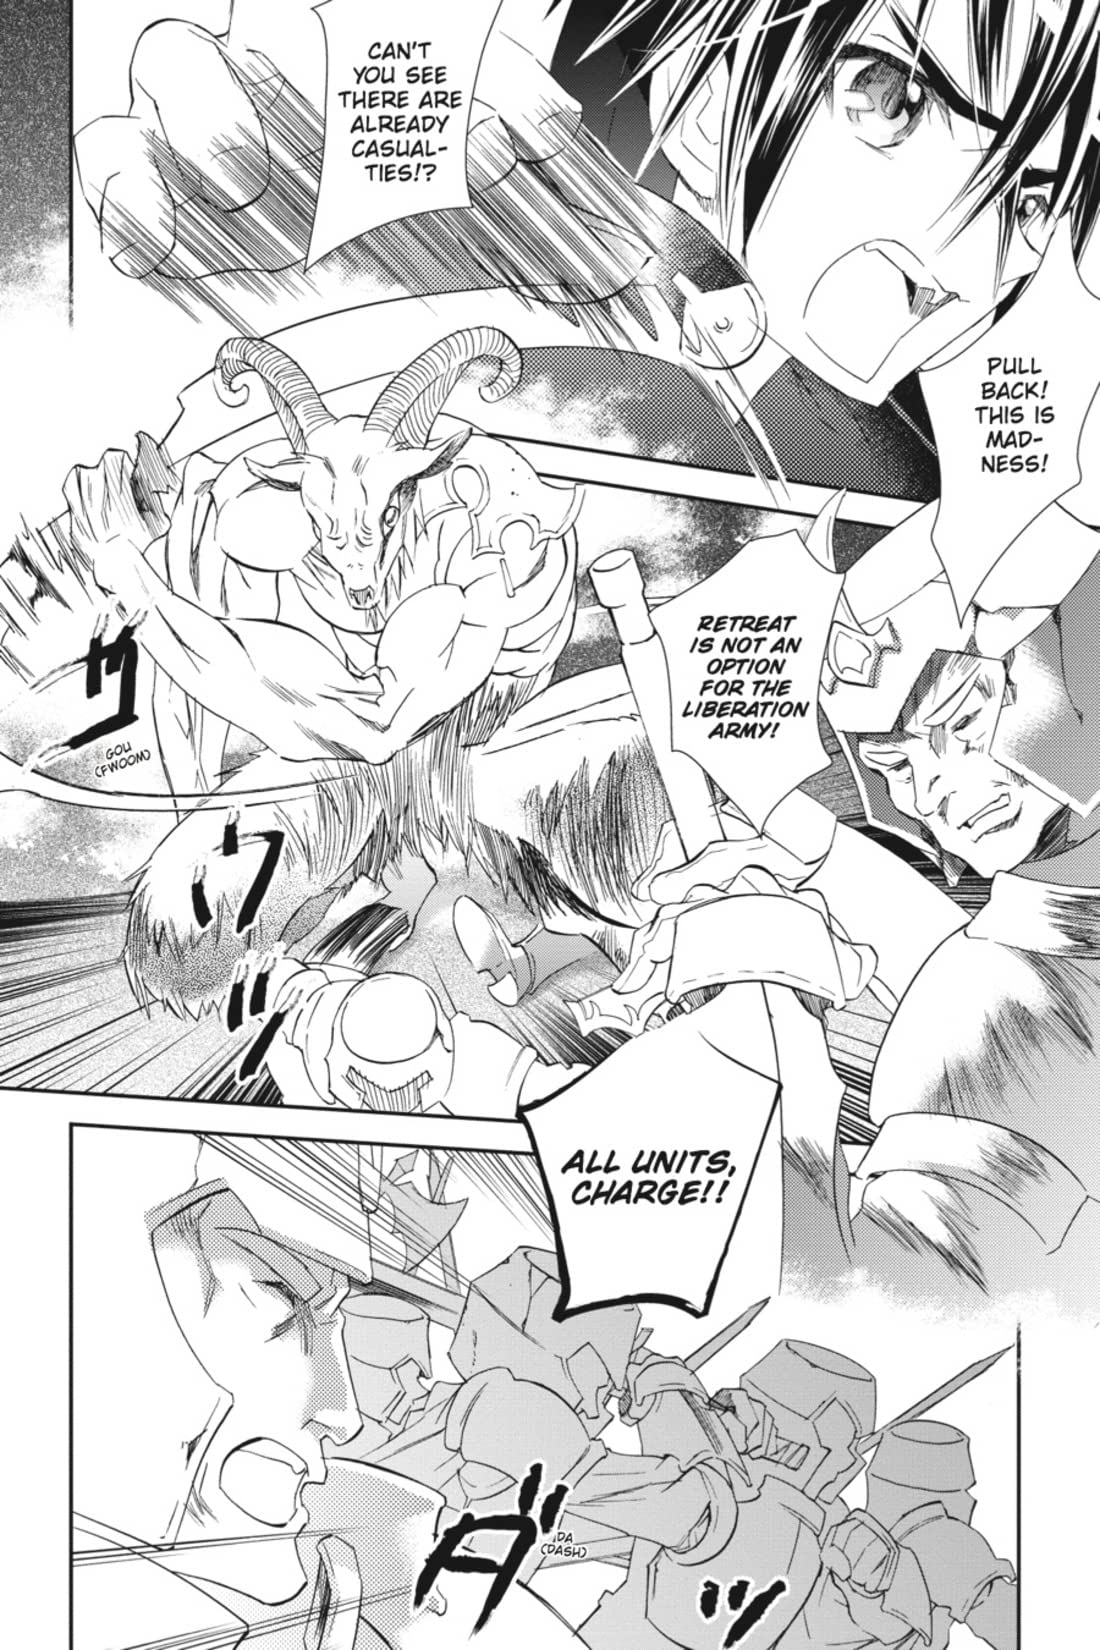 Sword Art Online: Aincrad Vol. 1